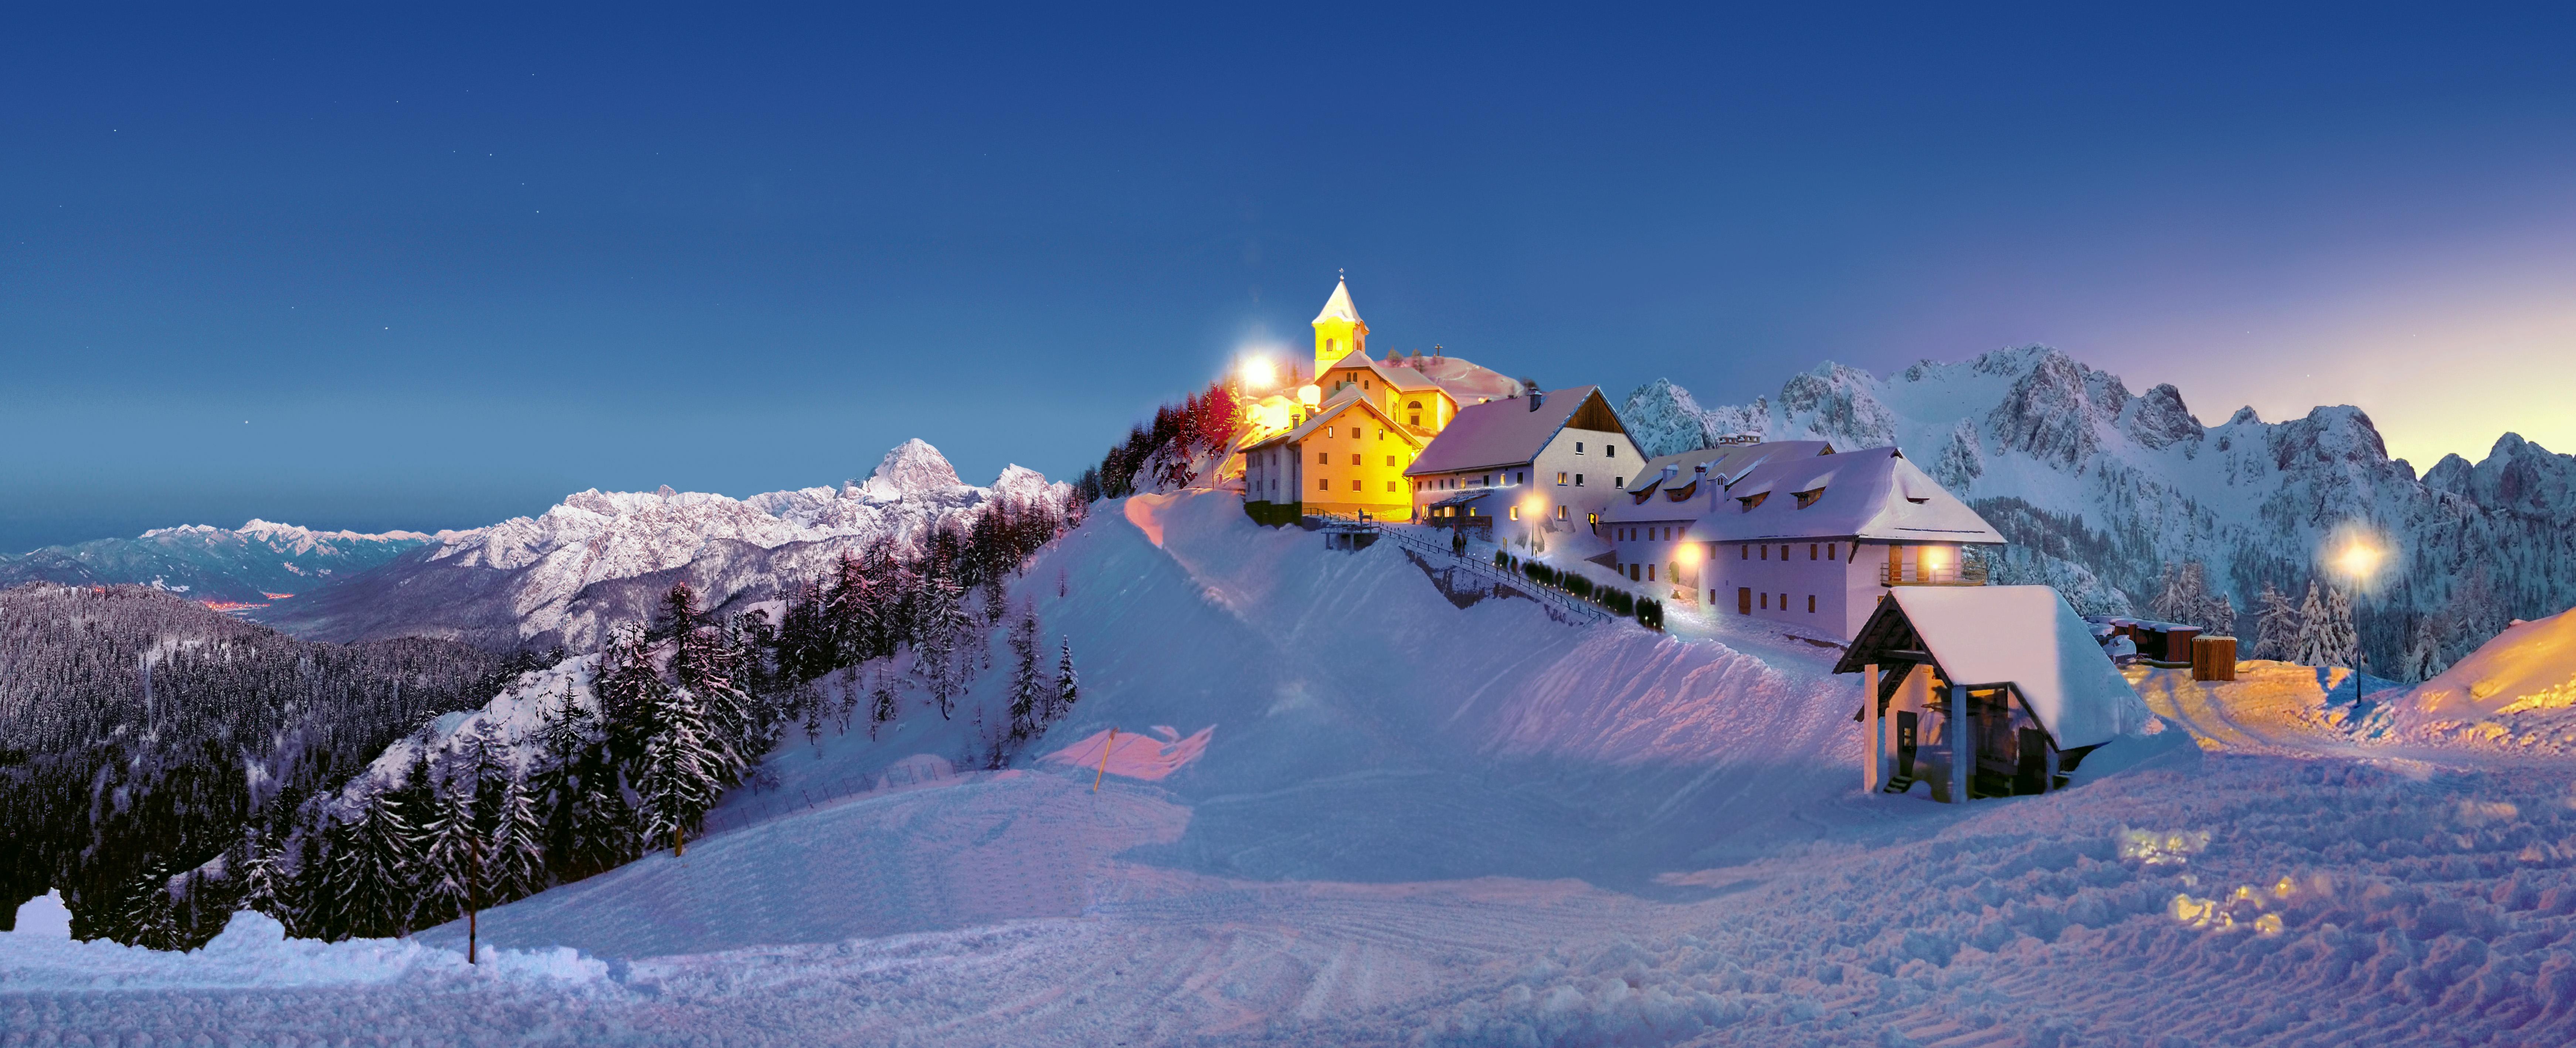 Left To Right The Weekly Ski Show In St Anton Austria TVB Am Arlberg Santuario Monte Lussari Italy Ph Costerni ESF School Champry